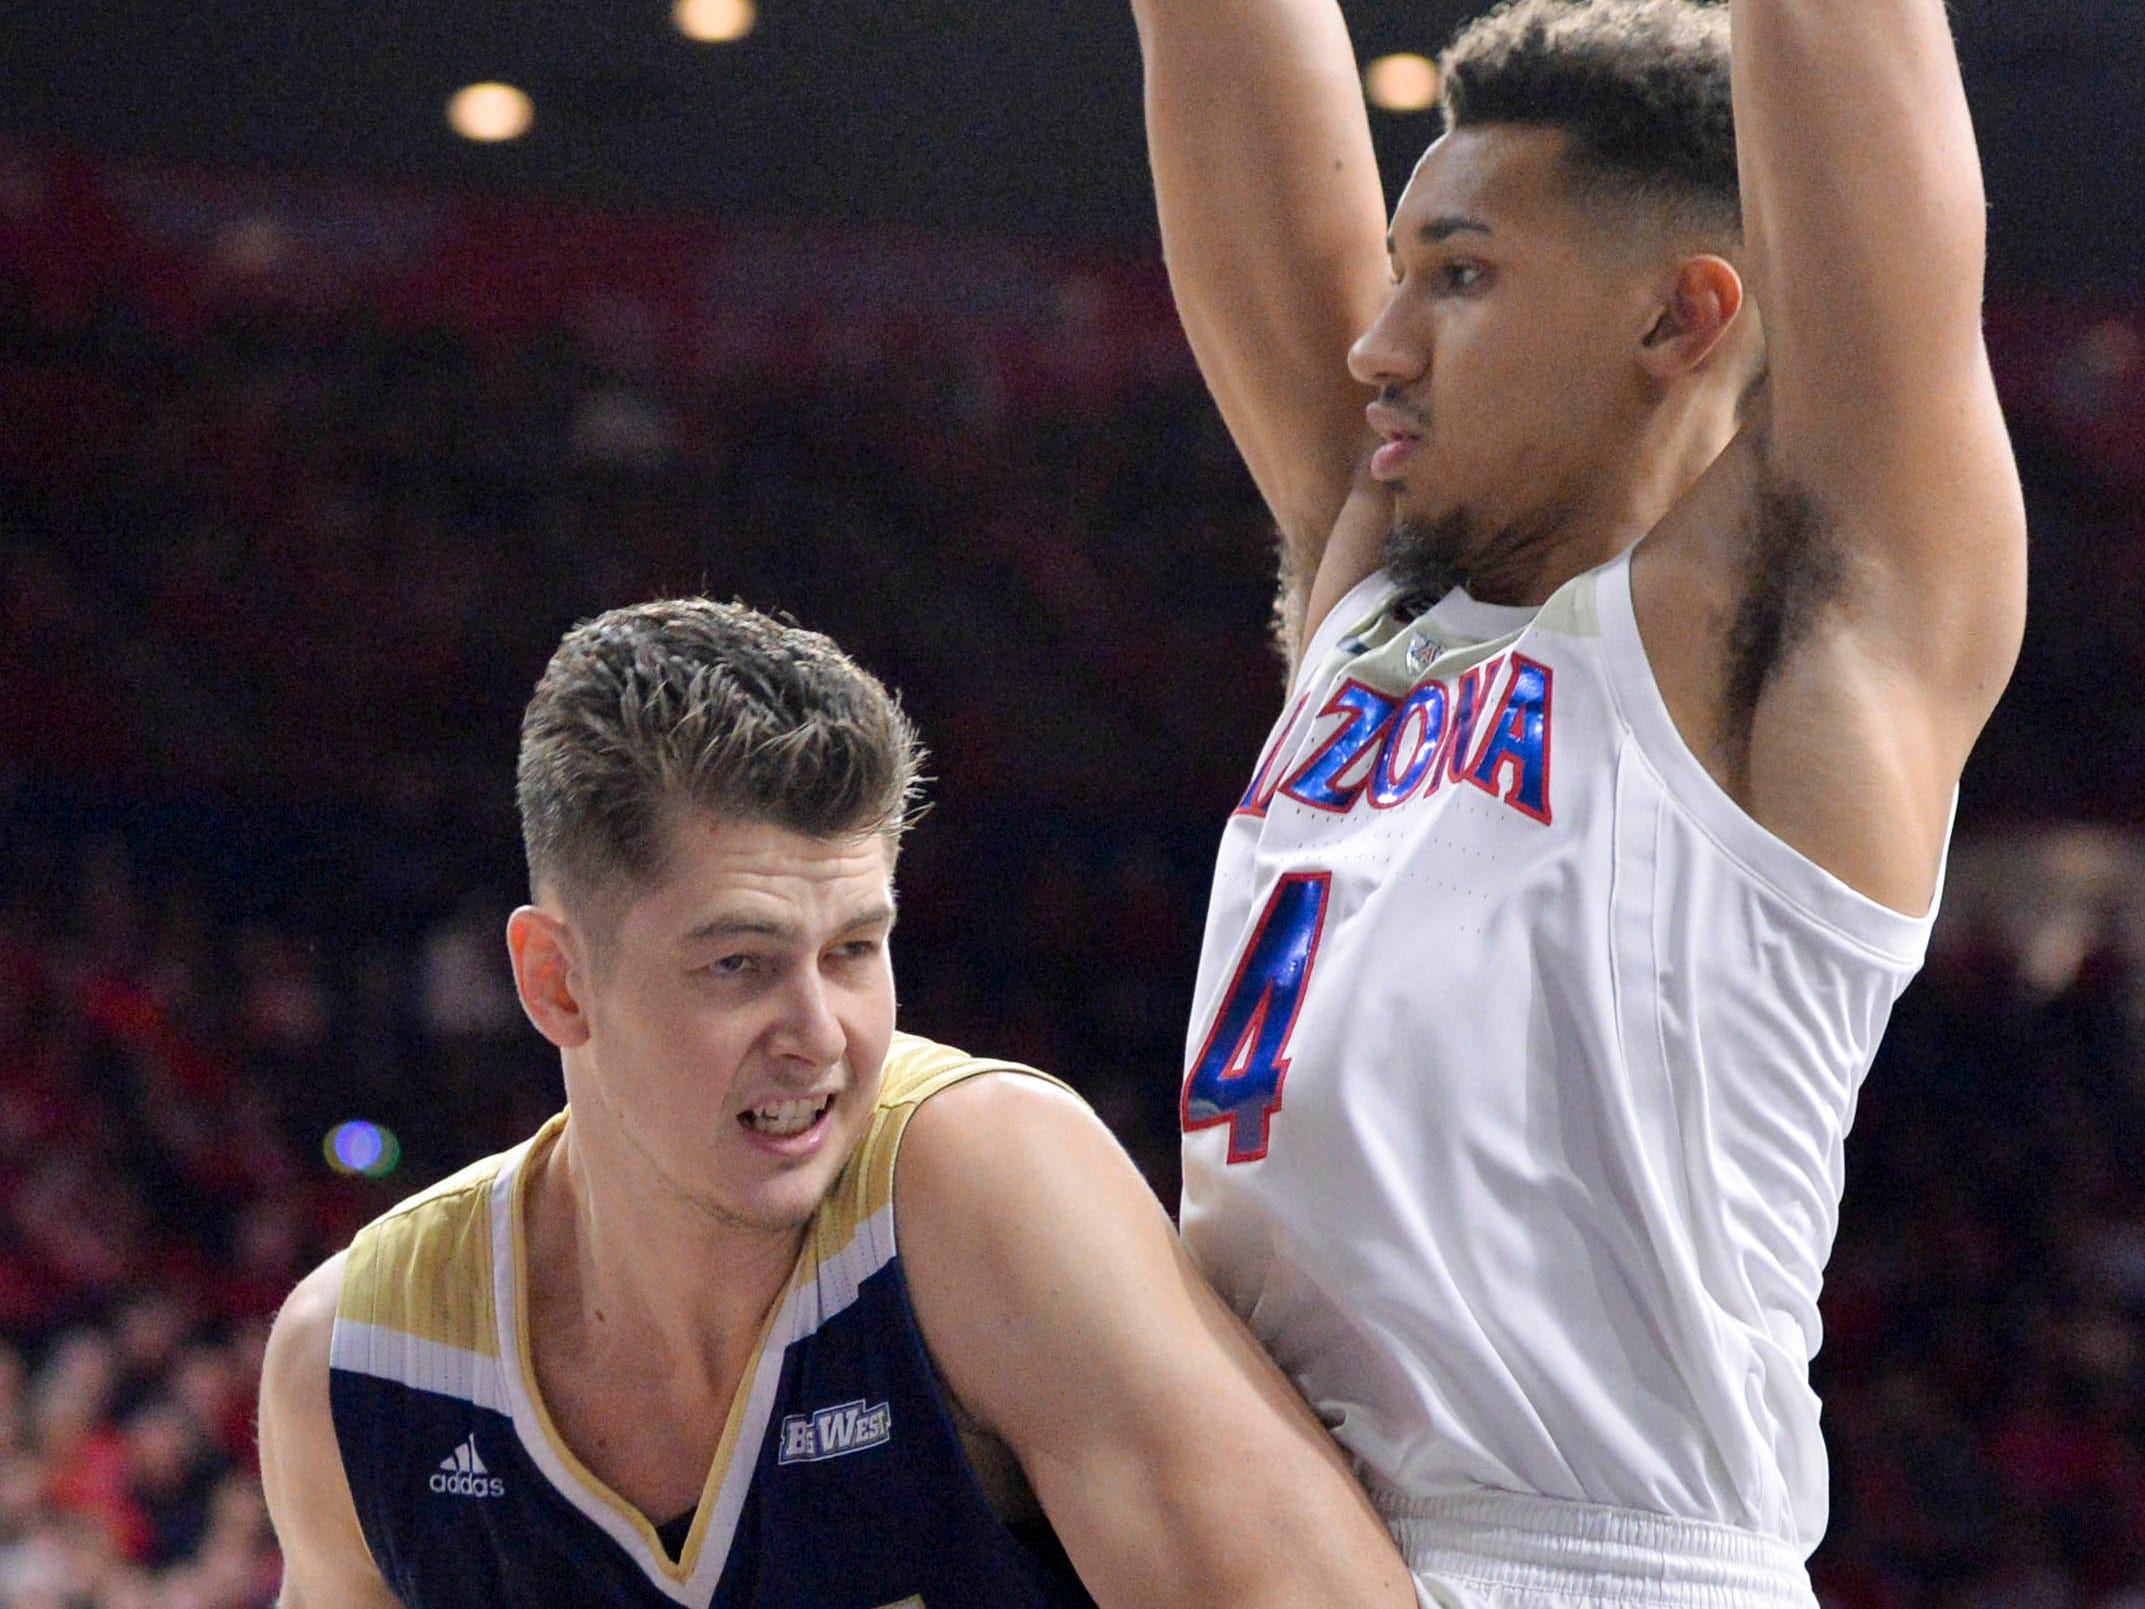 Dec 22, 2018; Tucson, AZ, USA; UC Davis Aggies center Matt Neufeld (13) is defended by Arizona Wildcats center Chase Jeter (4) during the first half at McKale Center. Mandatory Credit: Casey Sapio-USA TODAY Sports